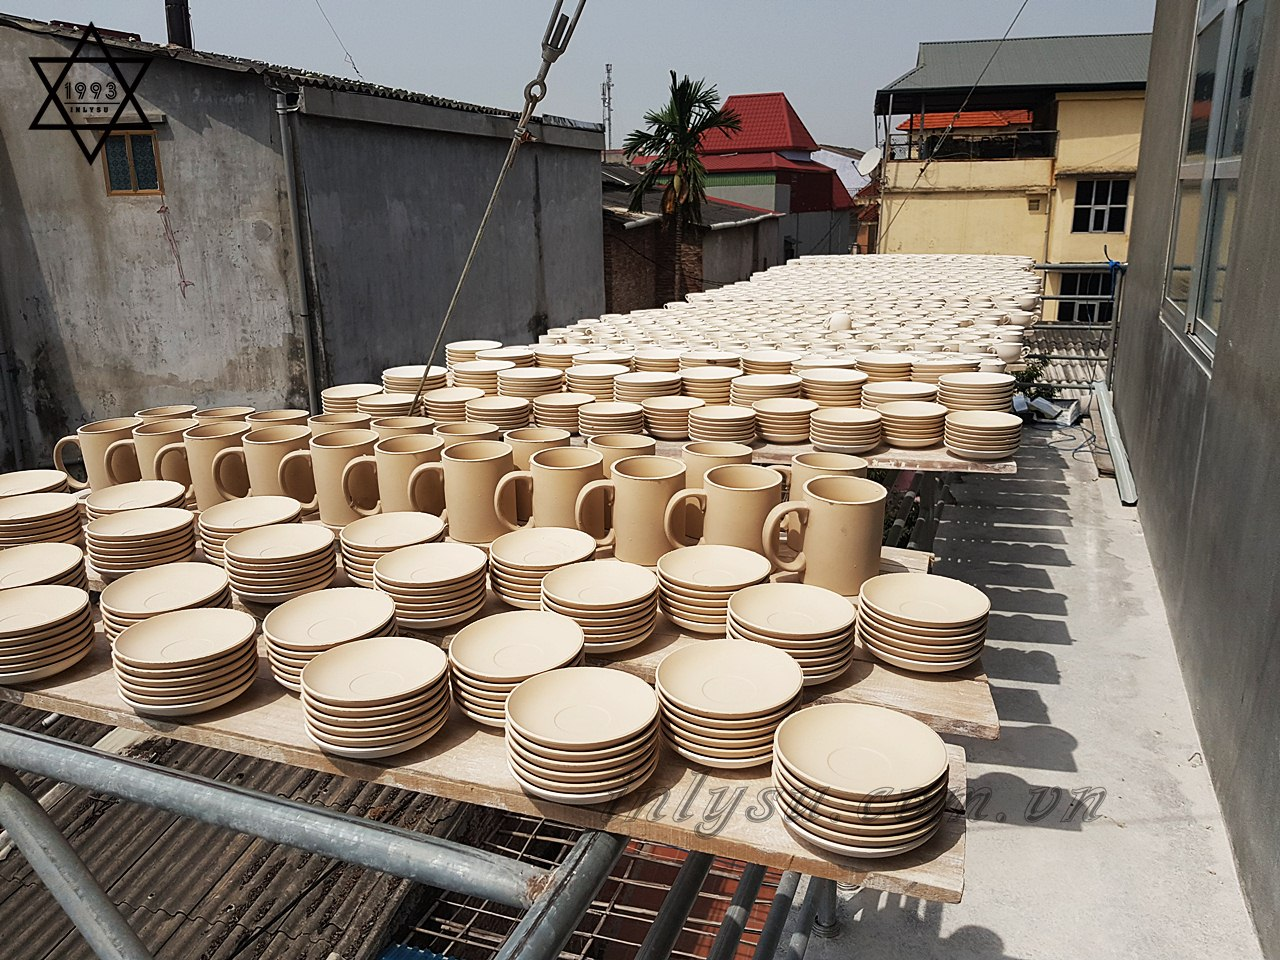 xuong-san-xuat-ly-su-vinaly-in trên gốm sứ